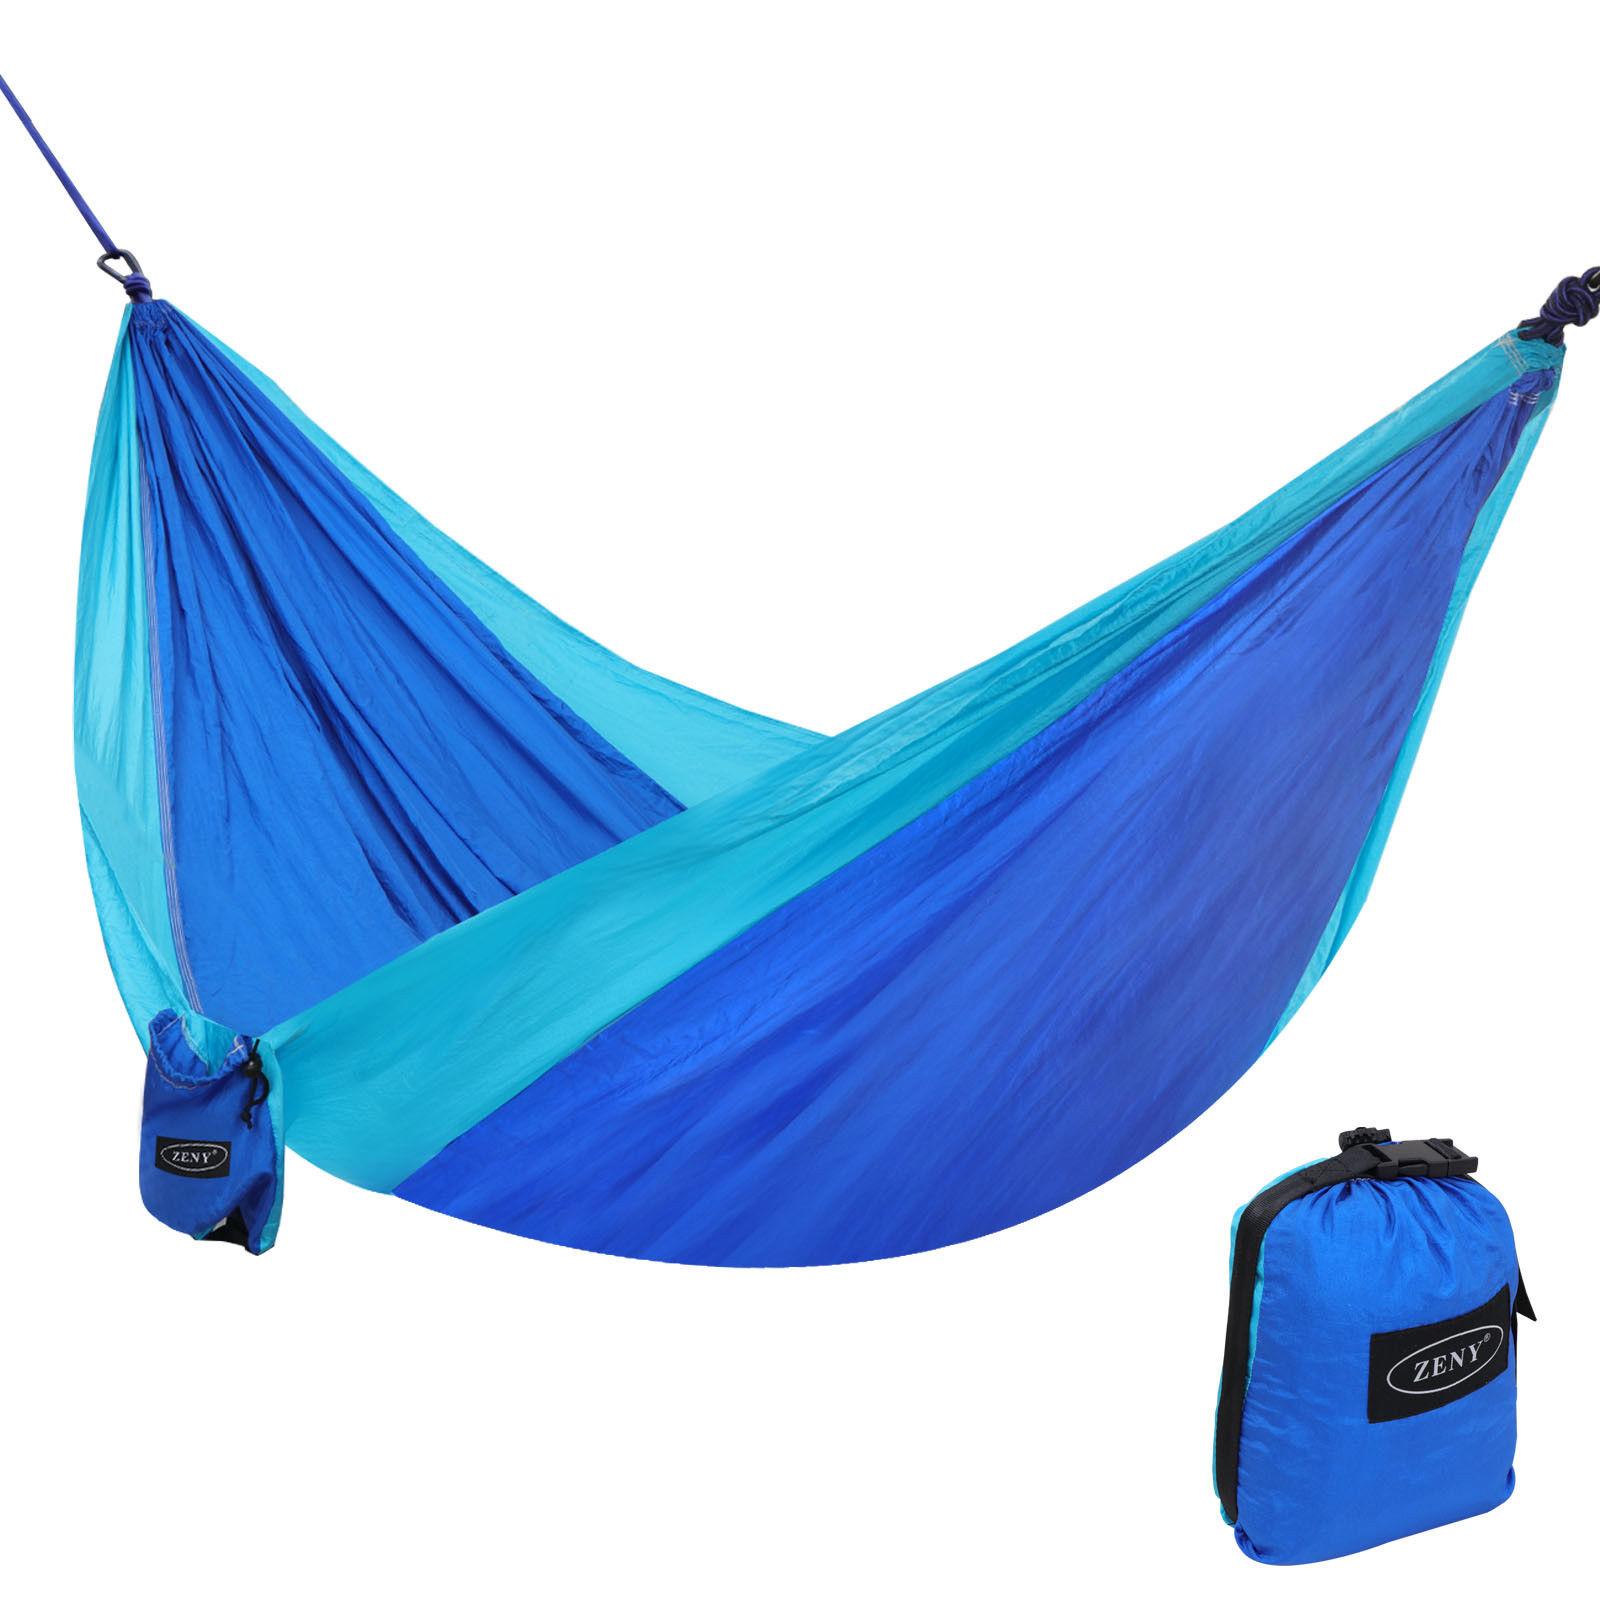 Zeny Portable Nylon Hammock Parachute Double Hanging Hammock For Camping,Backpacking,Travel,Beach,Yard